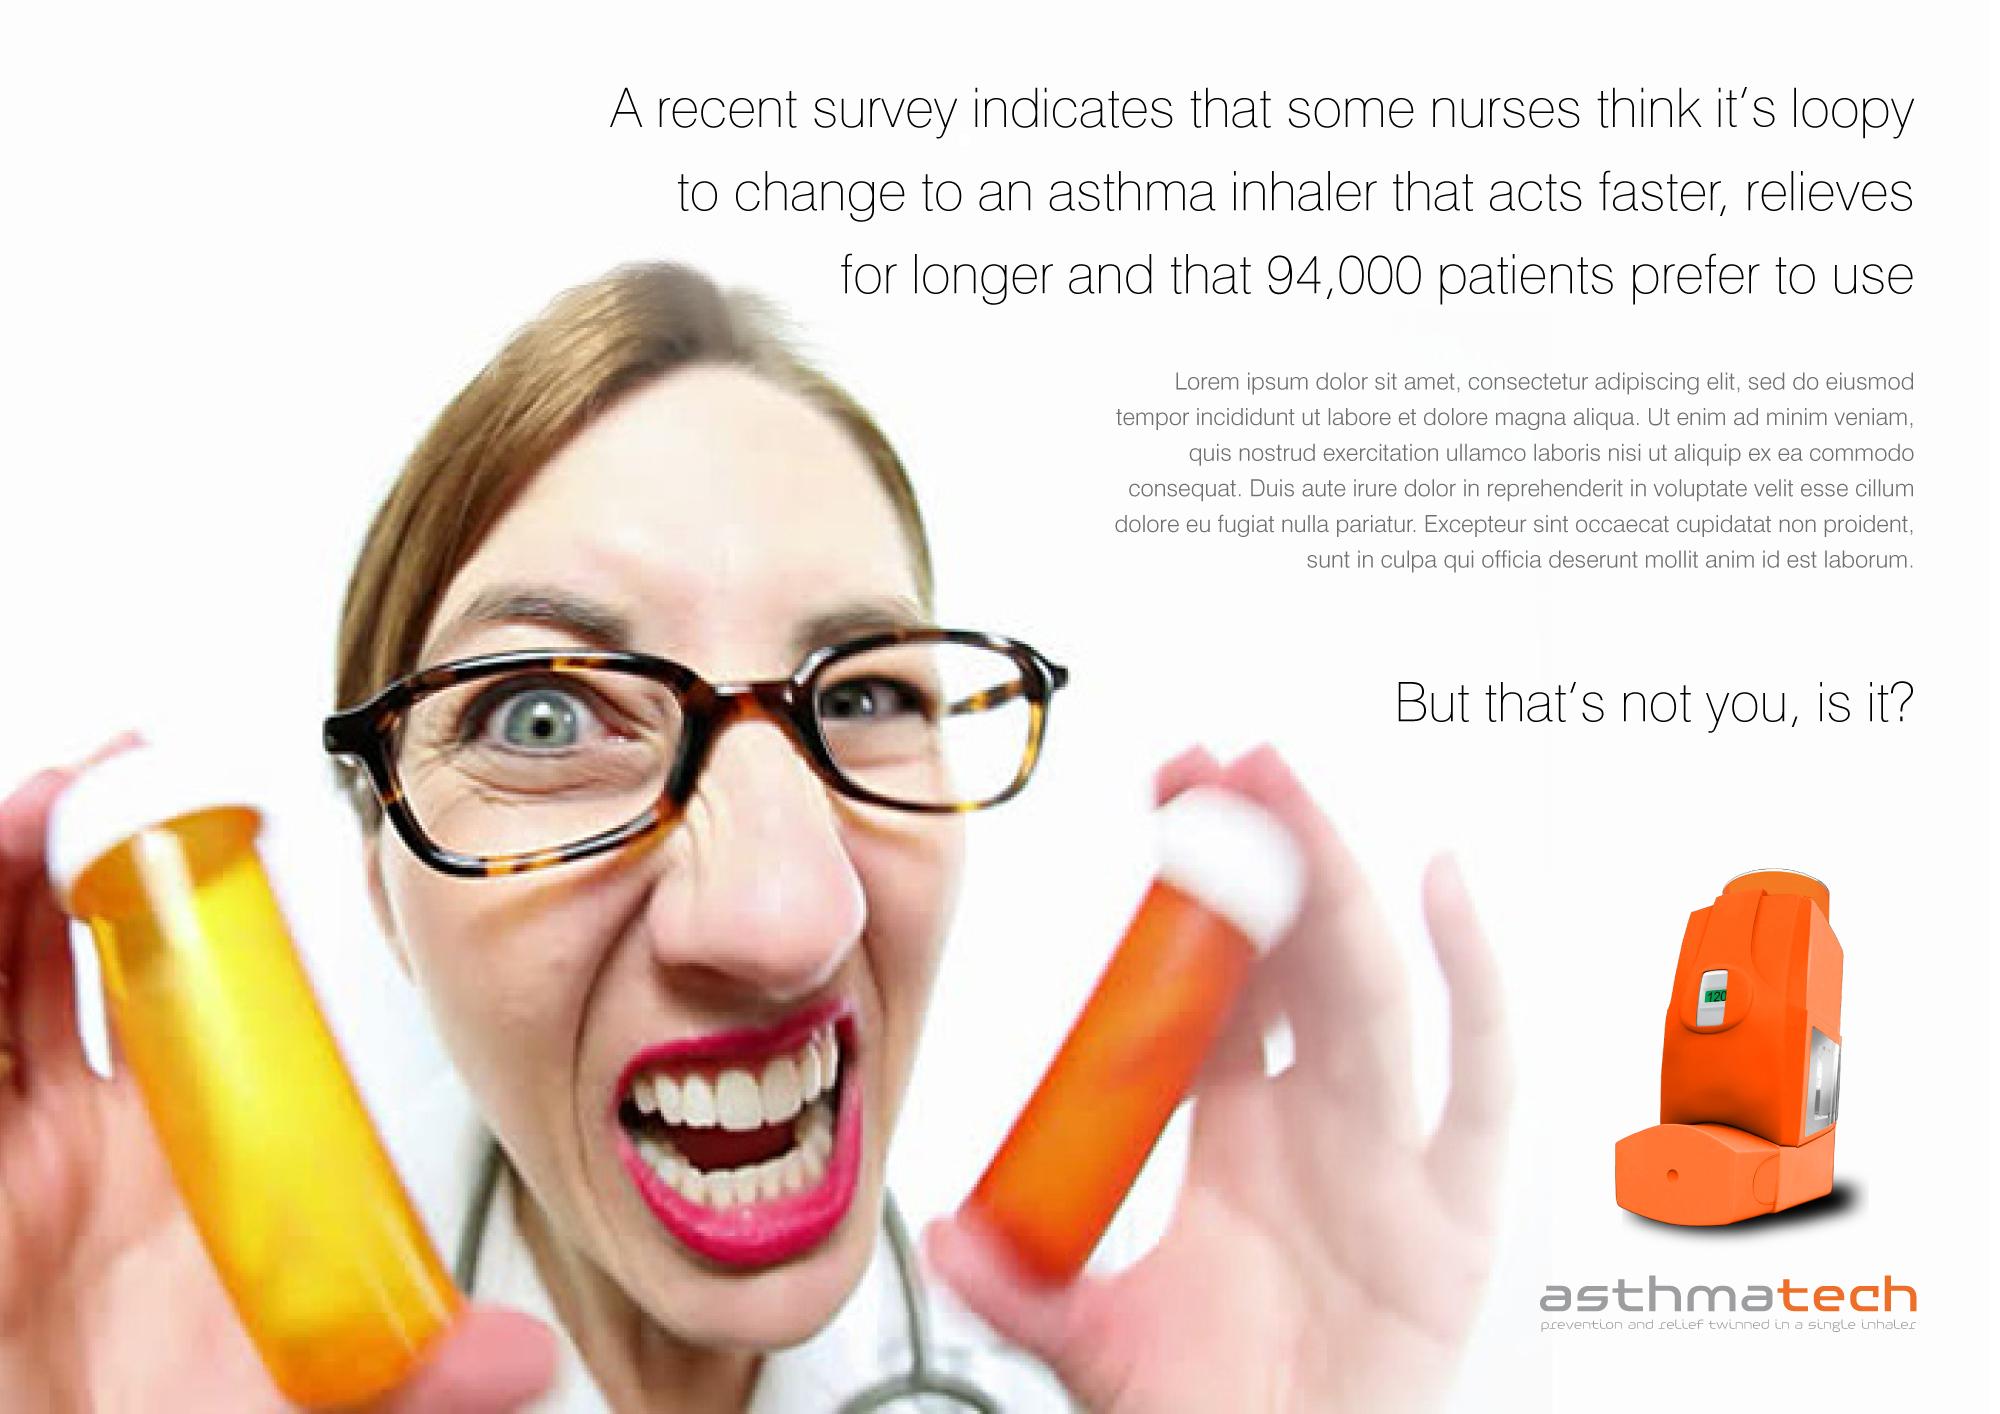 03_crazy_asthmatech_ad_concept